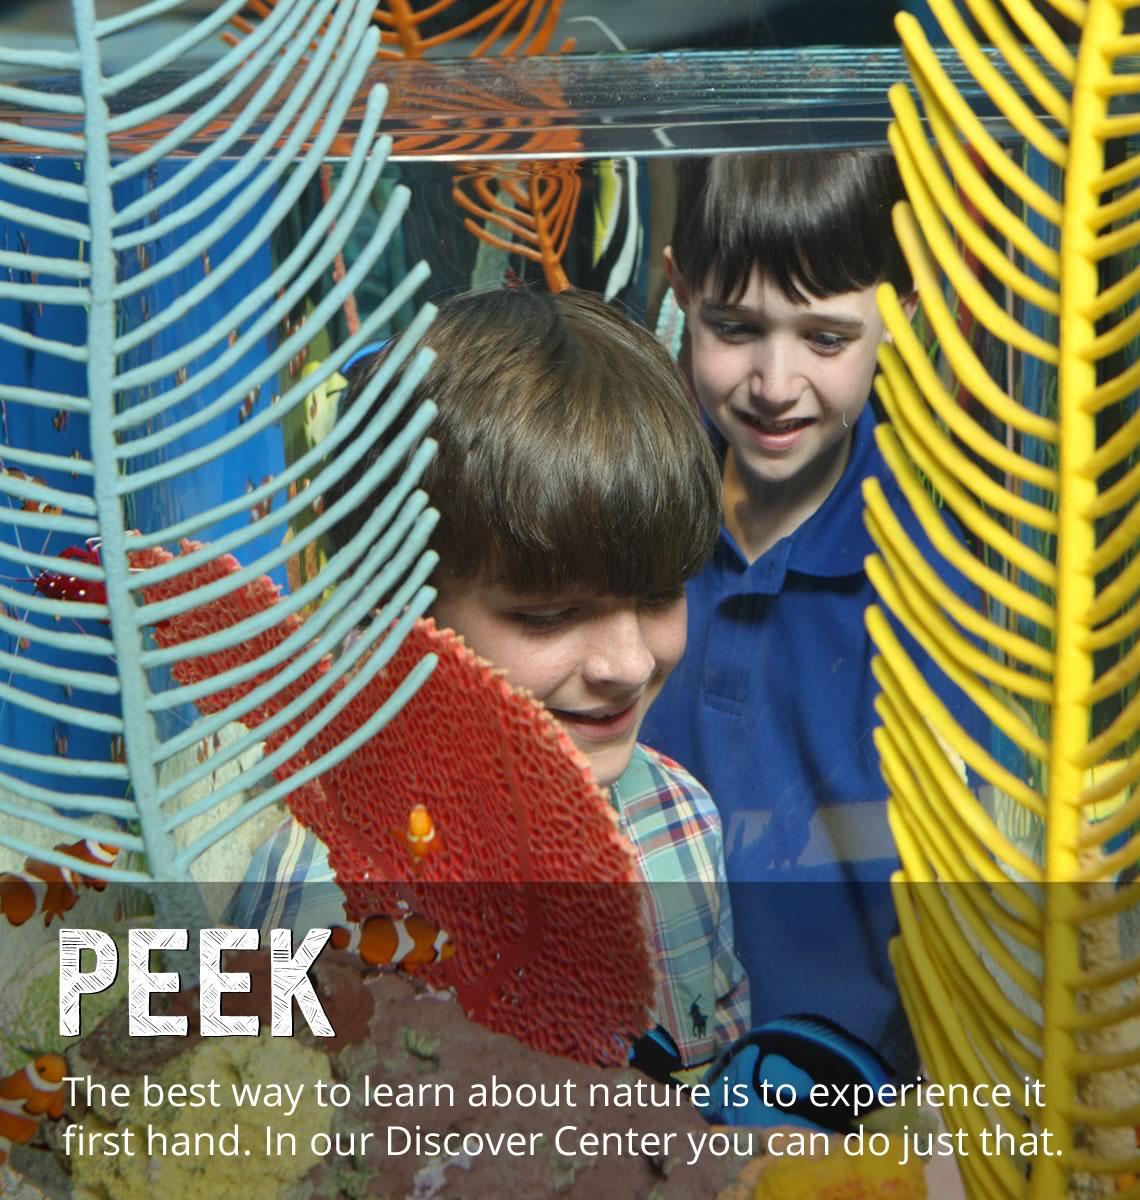 Discovery Center - Peek